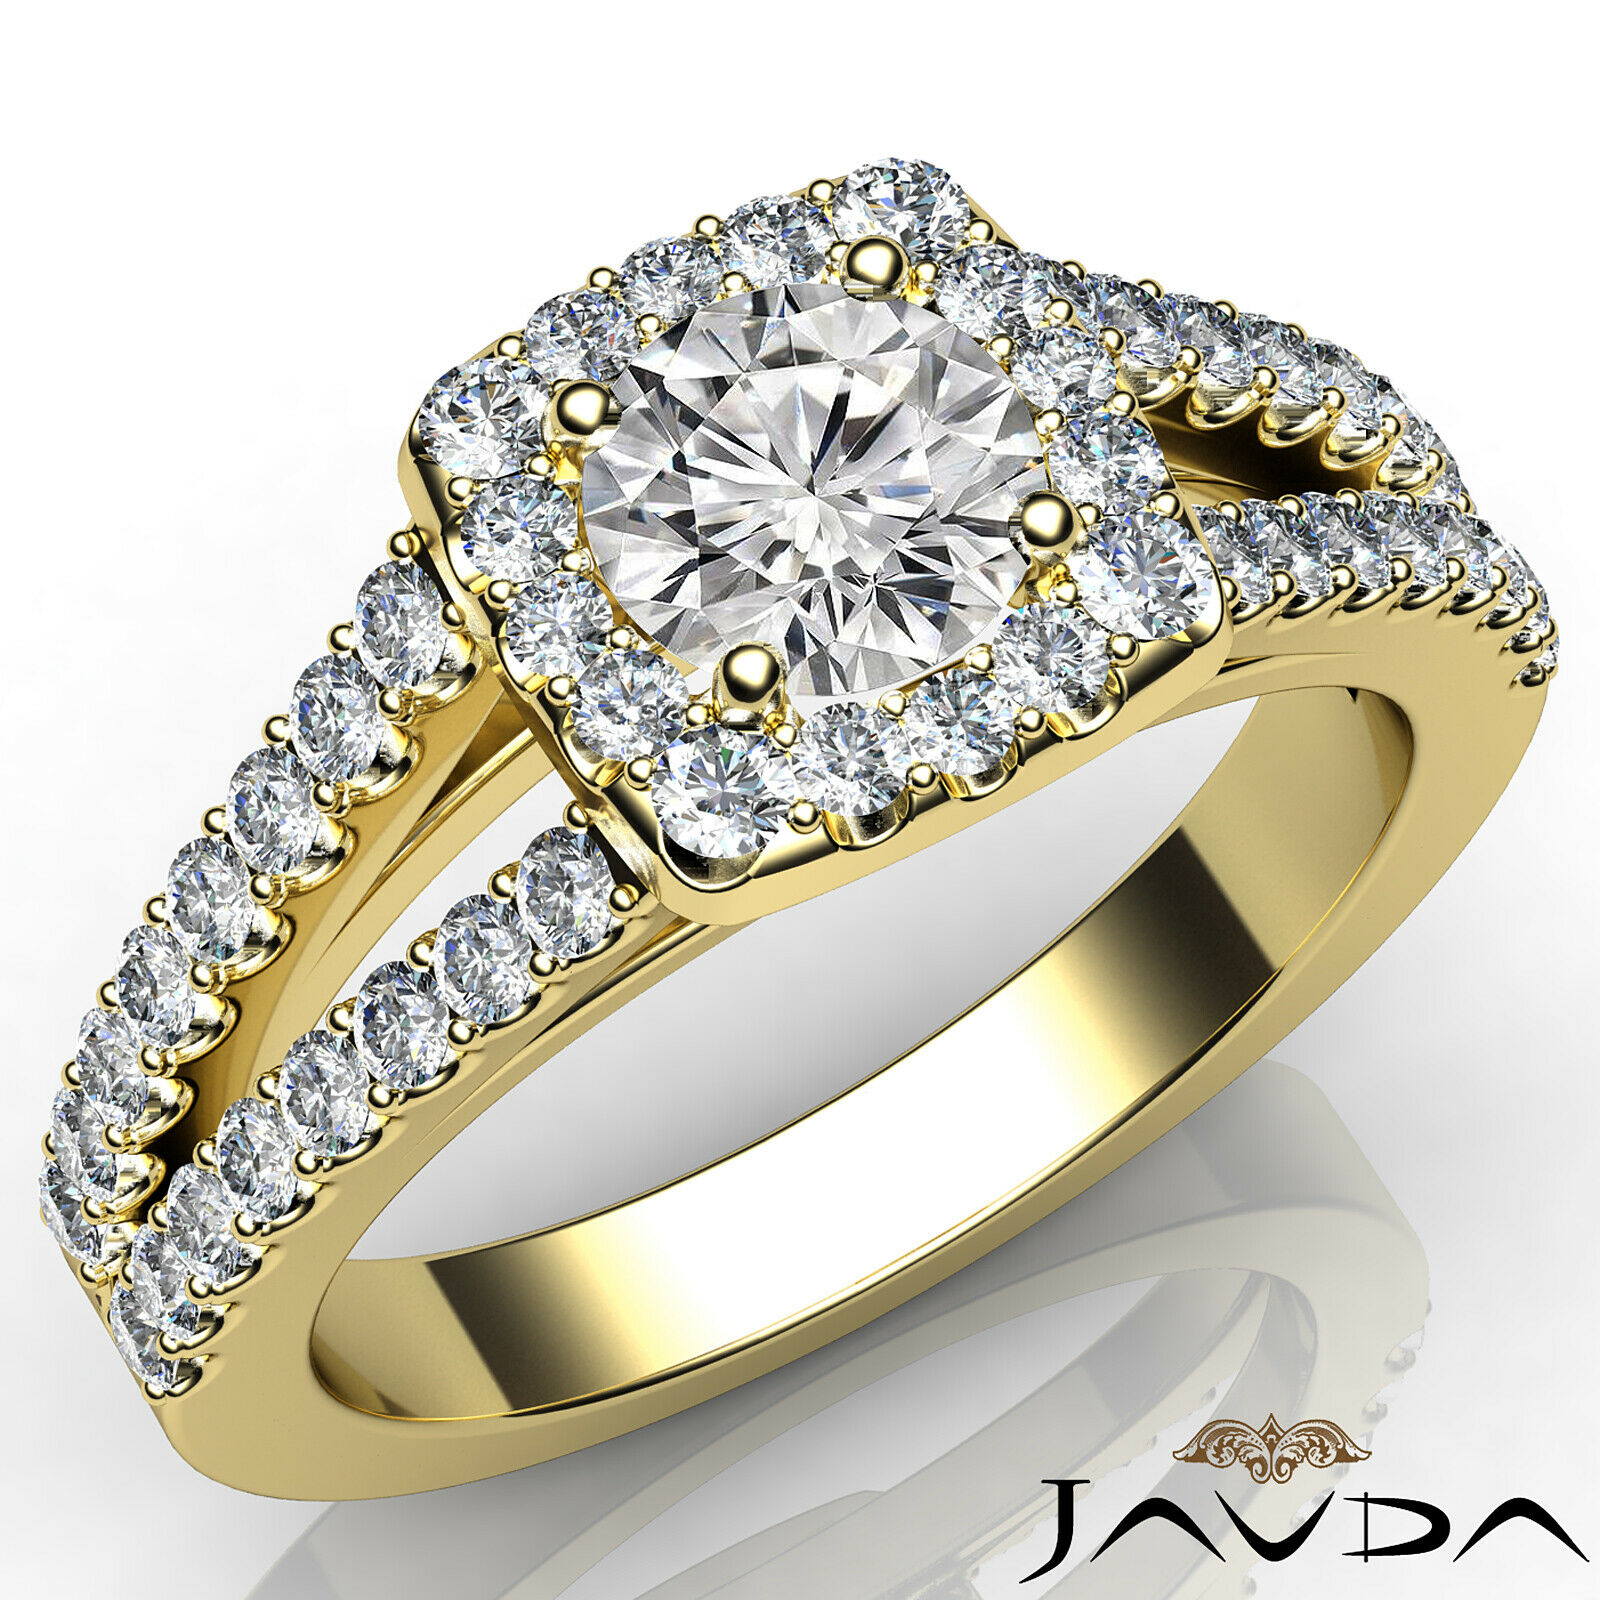 Round Diamond Engagement Halo Split Shank Ring GIA E VVS1 14k White Gold 1 1/4ct 1